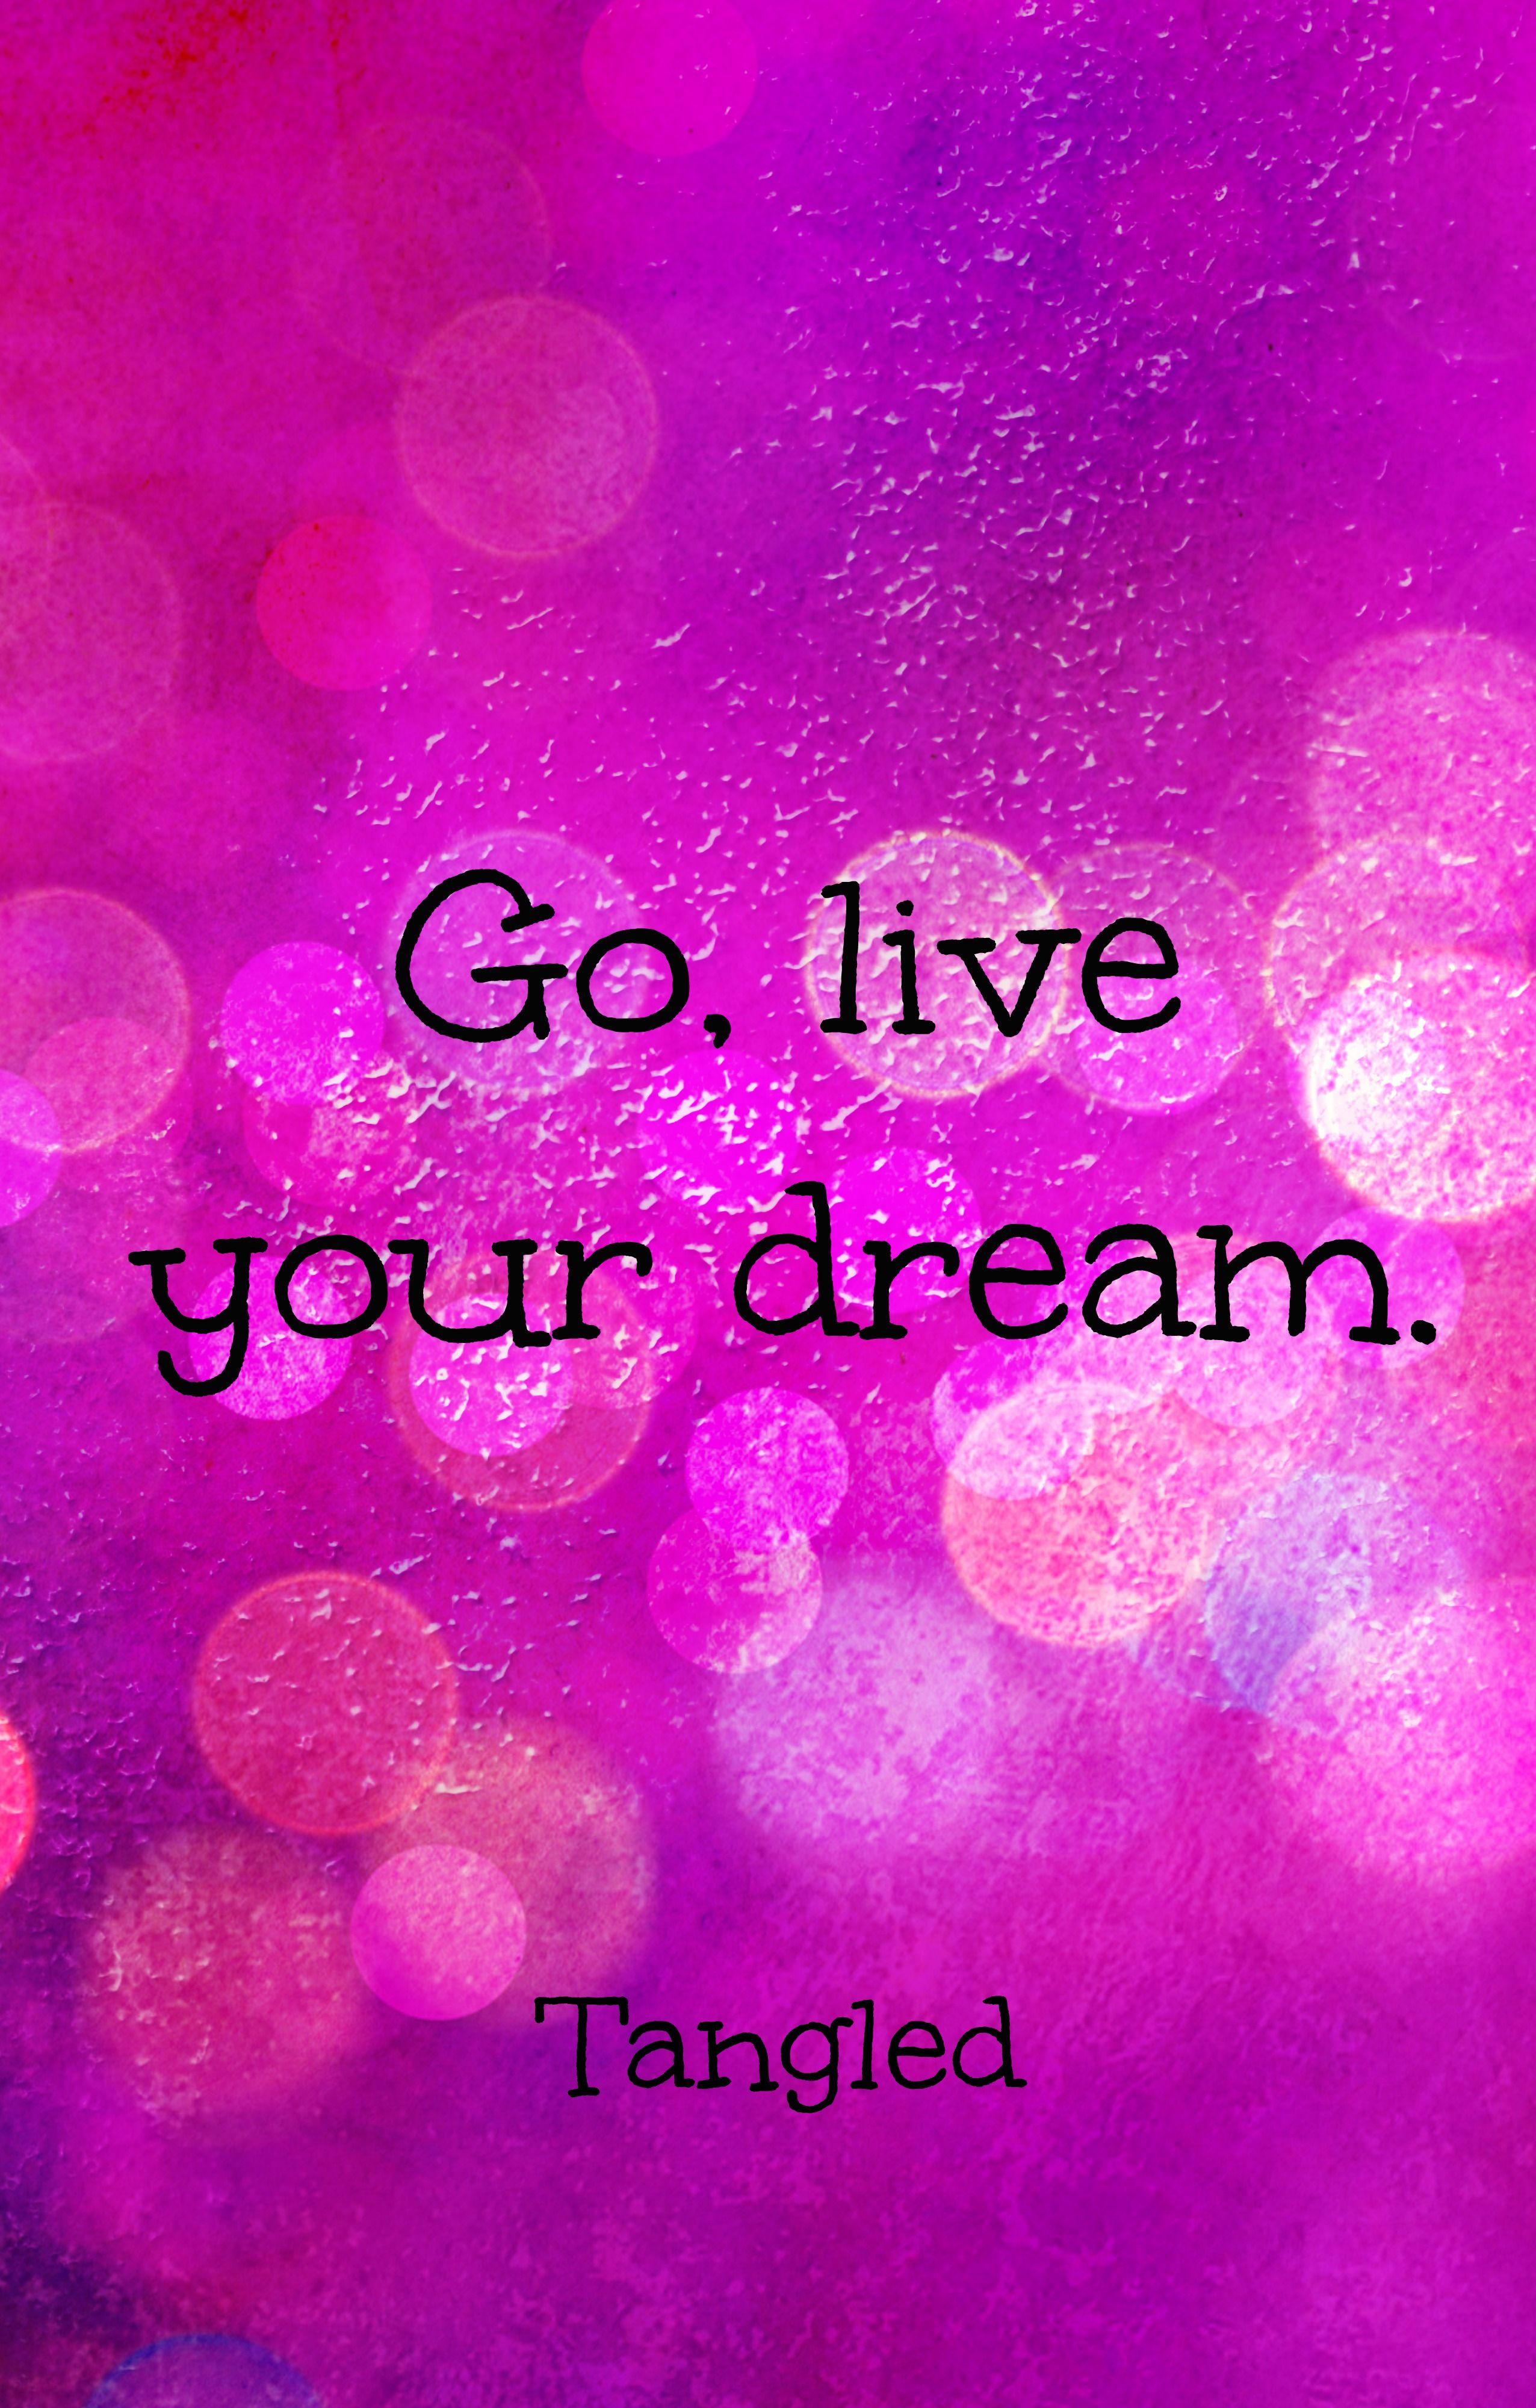 Tangled quotes, Disney wisdom. Your dream ducks I was ...